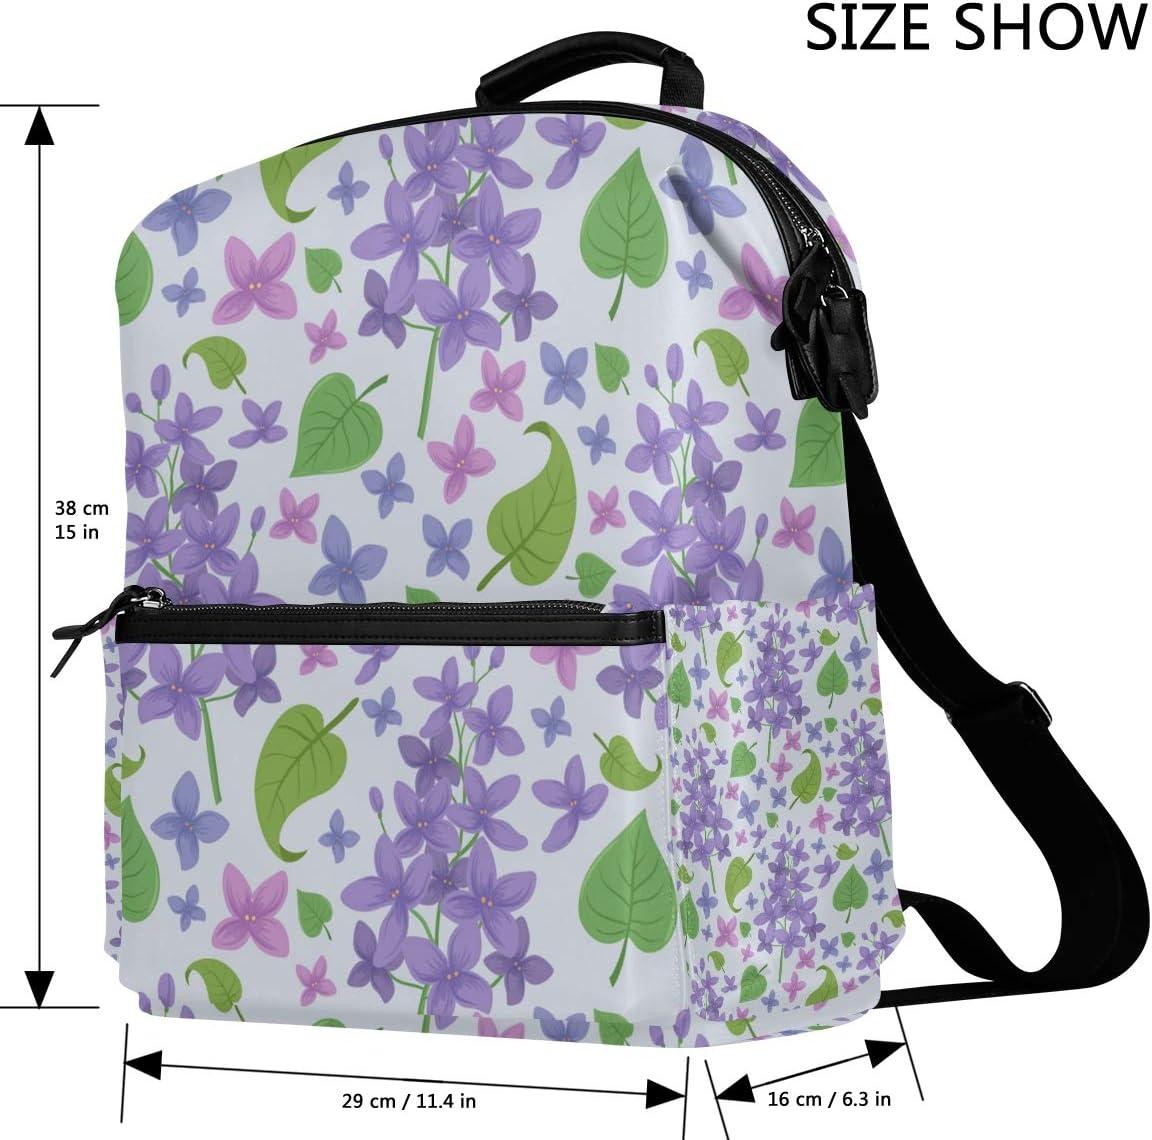 DEZIRO Purple Lilac Flowers and Leaves School Bags Backpacks Daypack Travel Bag